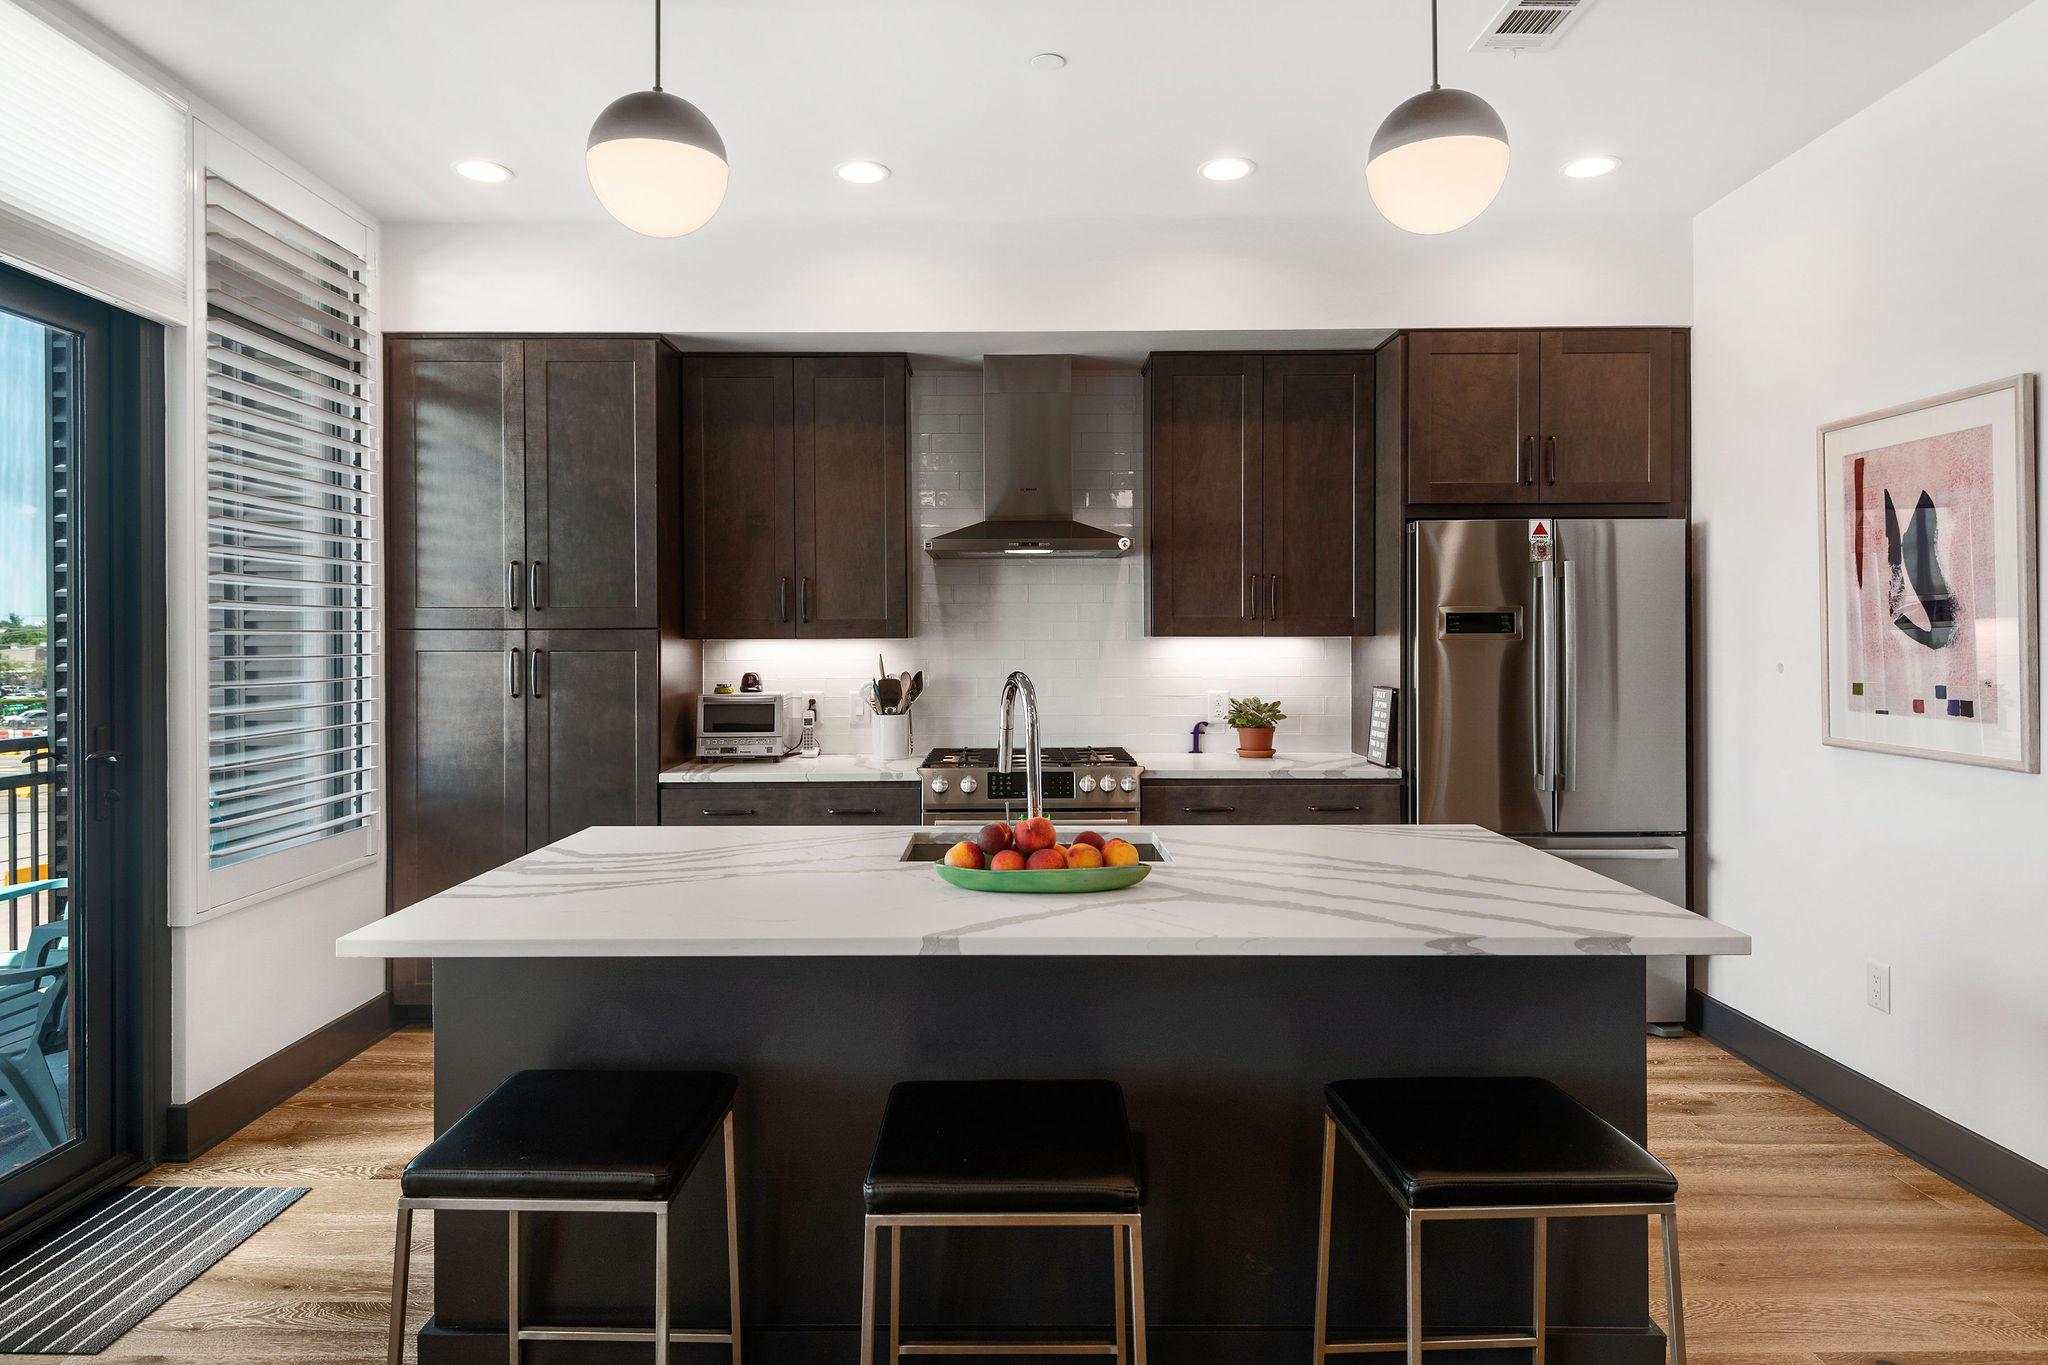 Gadsdenboro Homes For Sale - 5 Gadsdenboro, Charleston, SC - 26